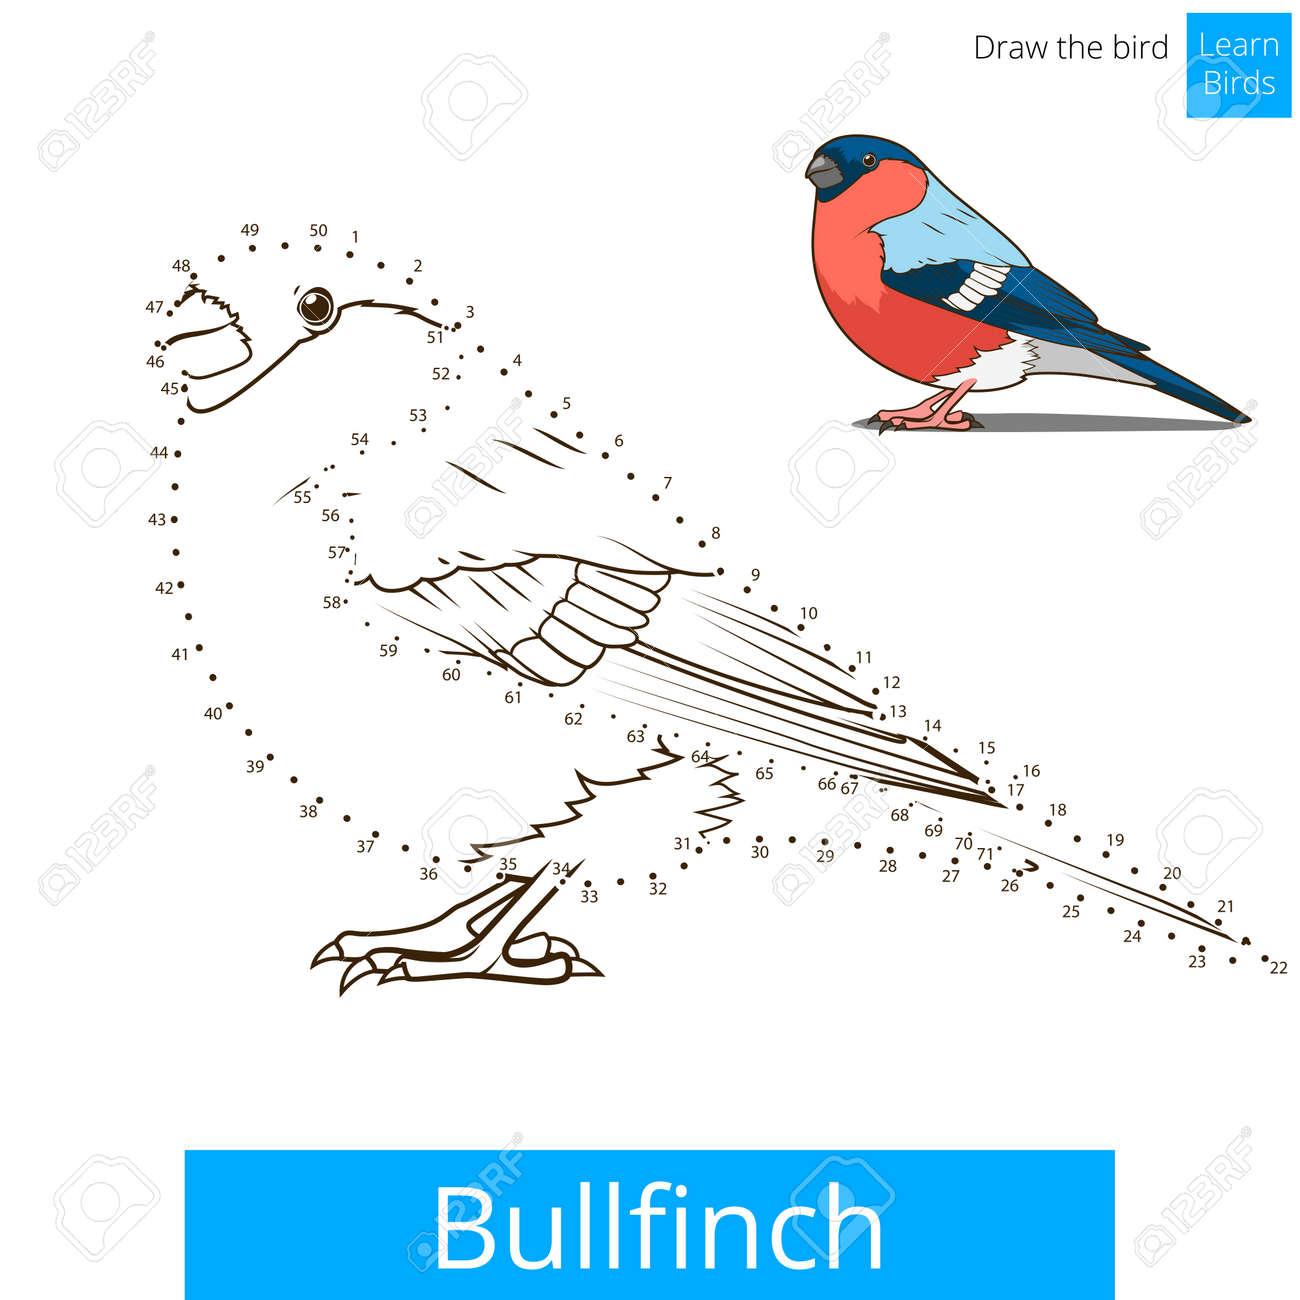 Bullfinch Learn Birds Educational Game To Draw Vector Illustration